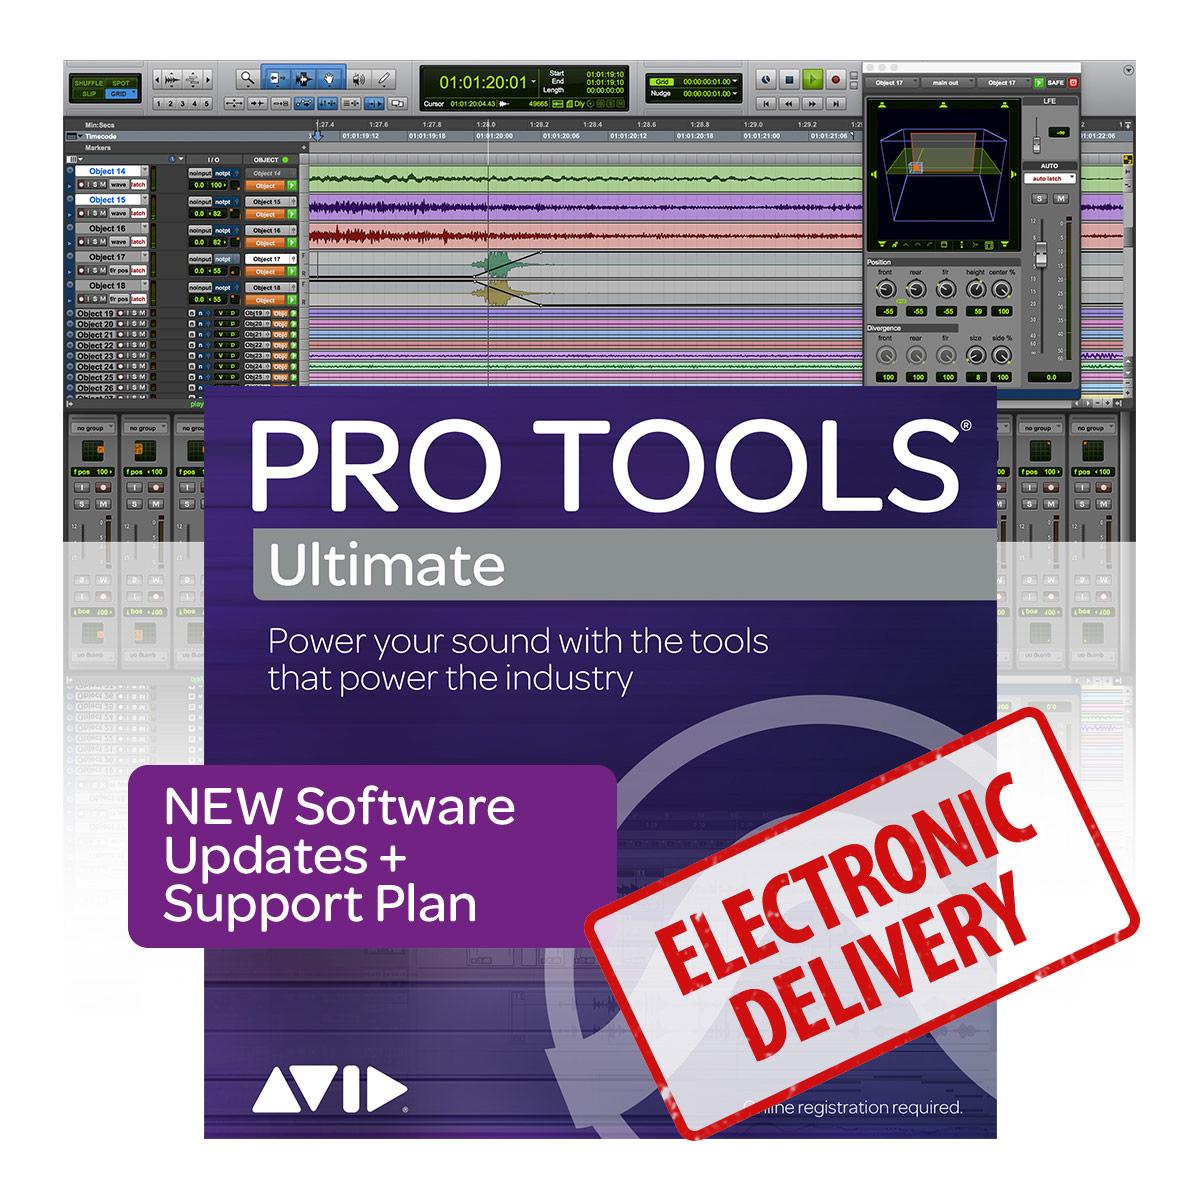 Avid Pro Tools | Ultimate Upgrade & Support Plan Reinstatement